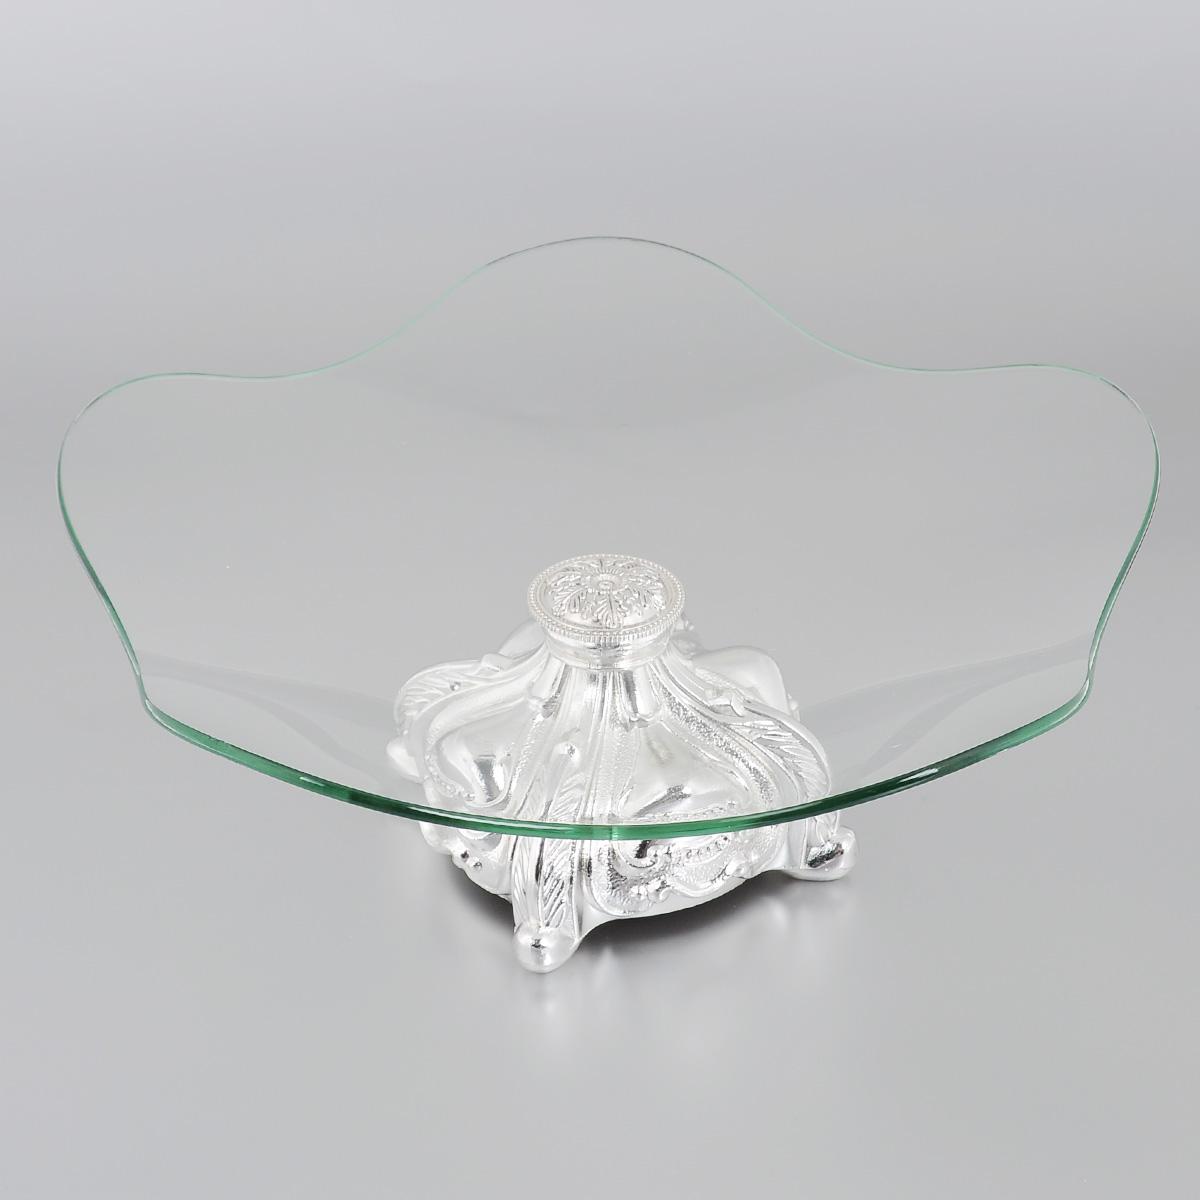 Ваза универсальная Marquis, 30 см х 30 см. 3093-MR ваза d16 5 см х h24 см